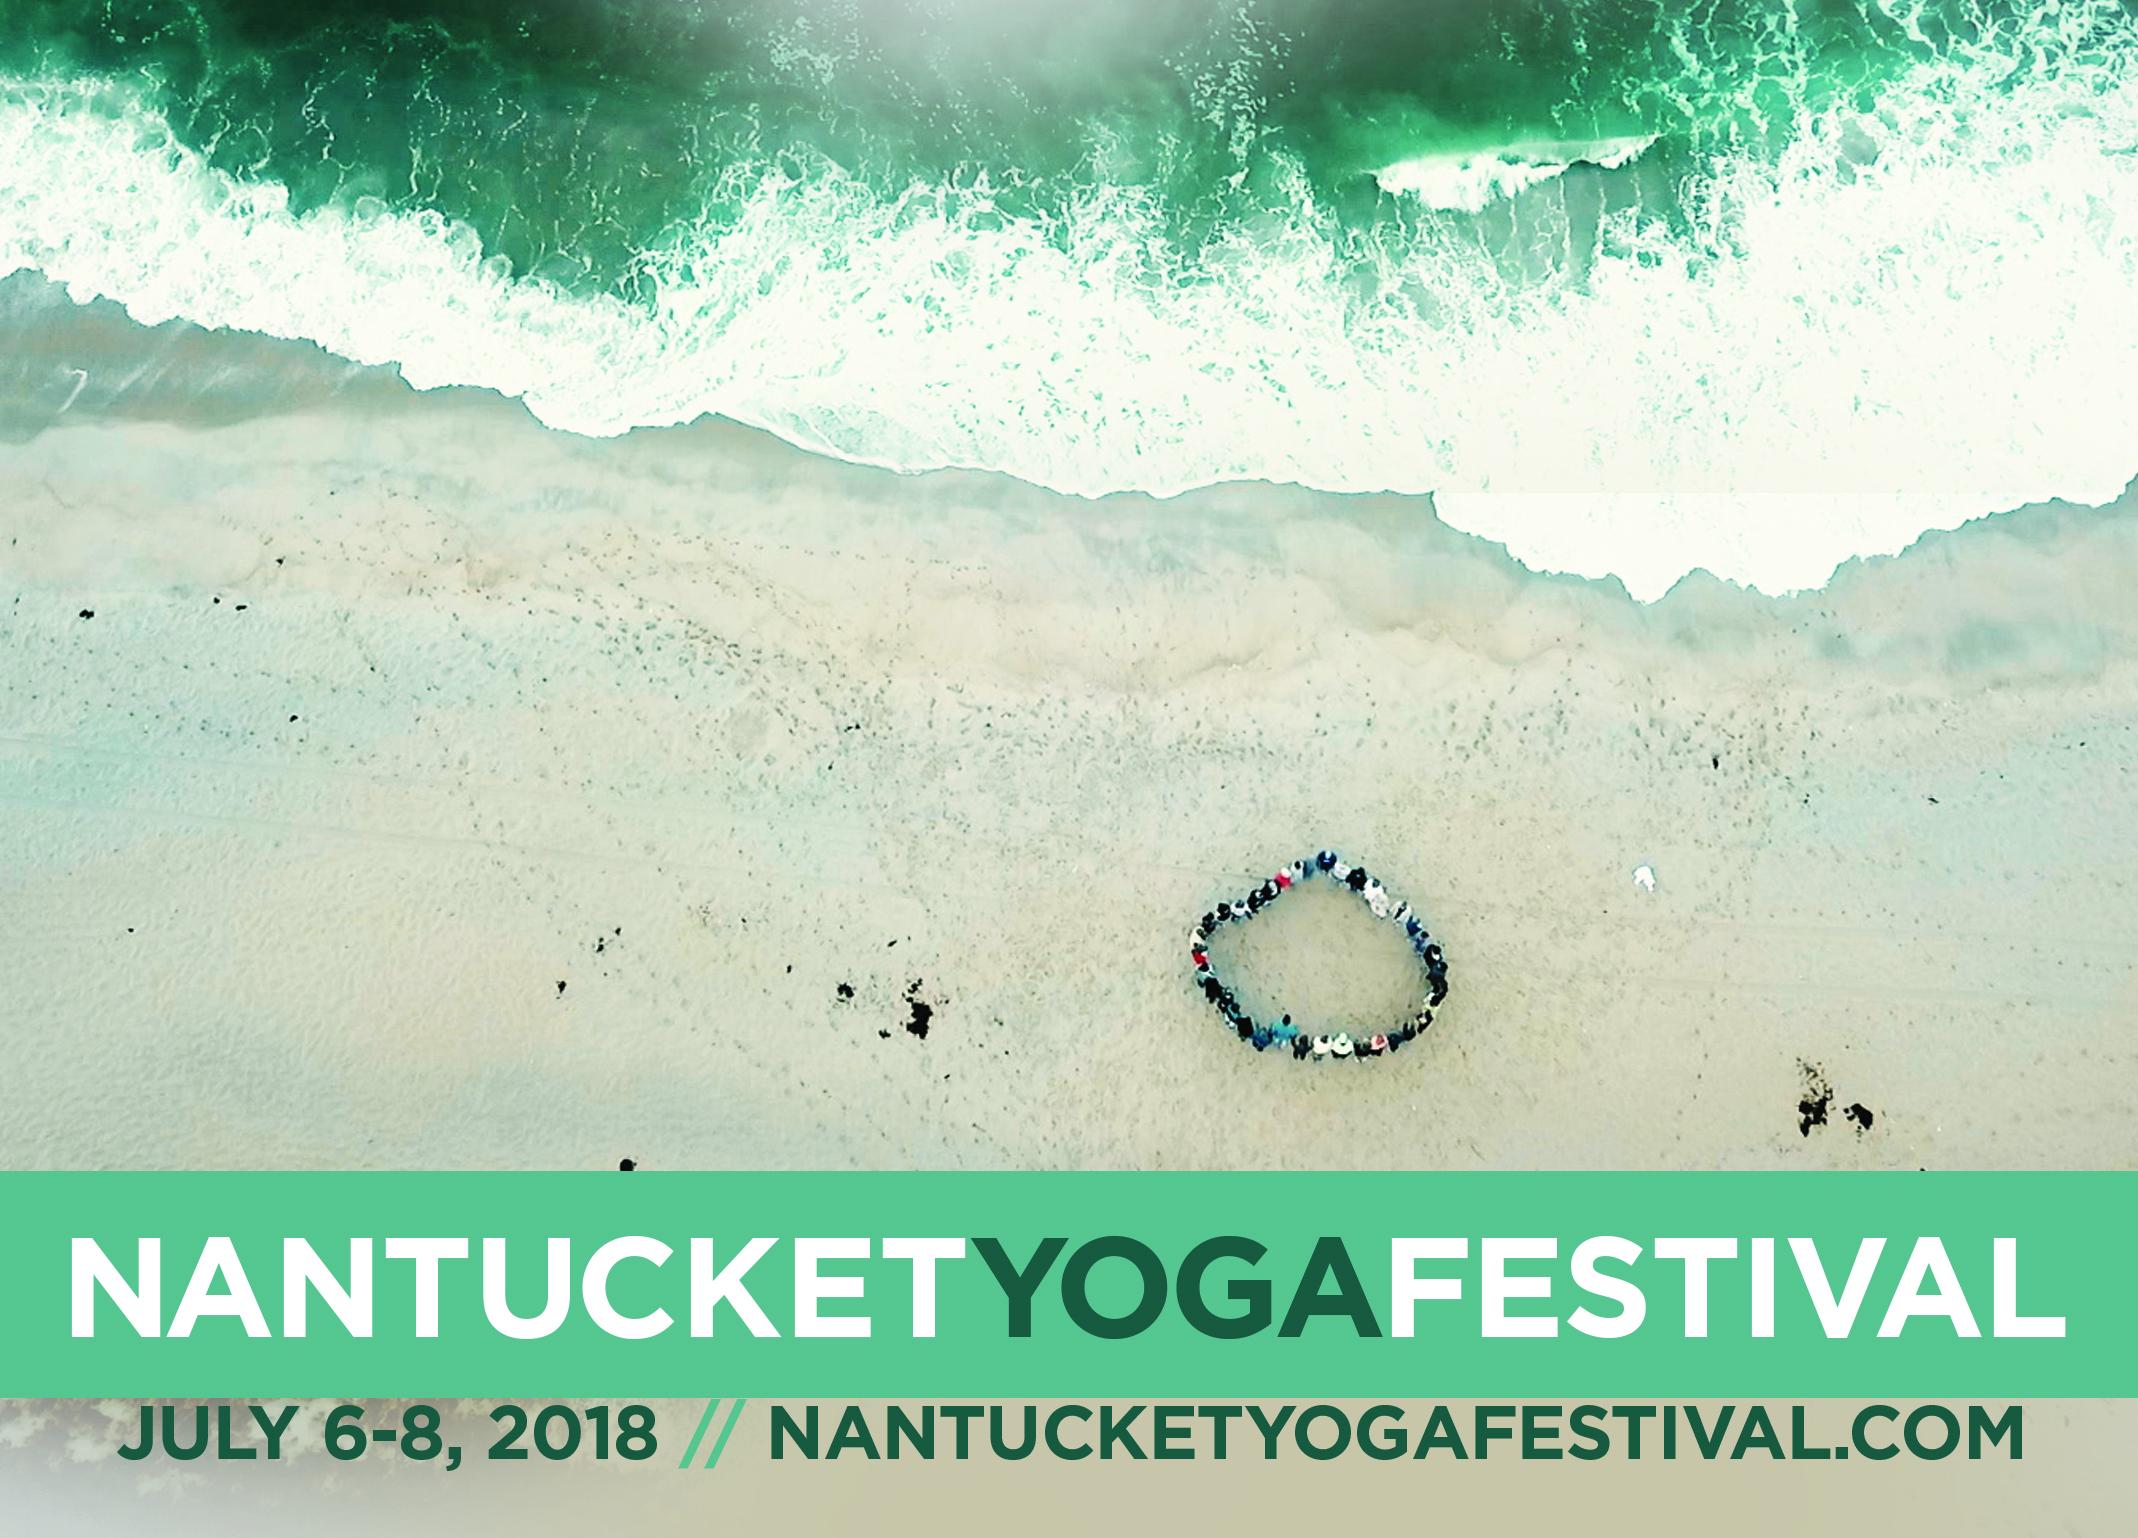 NantucketYogaFestival_2018Front